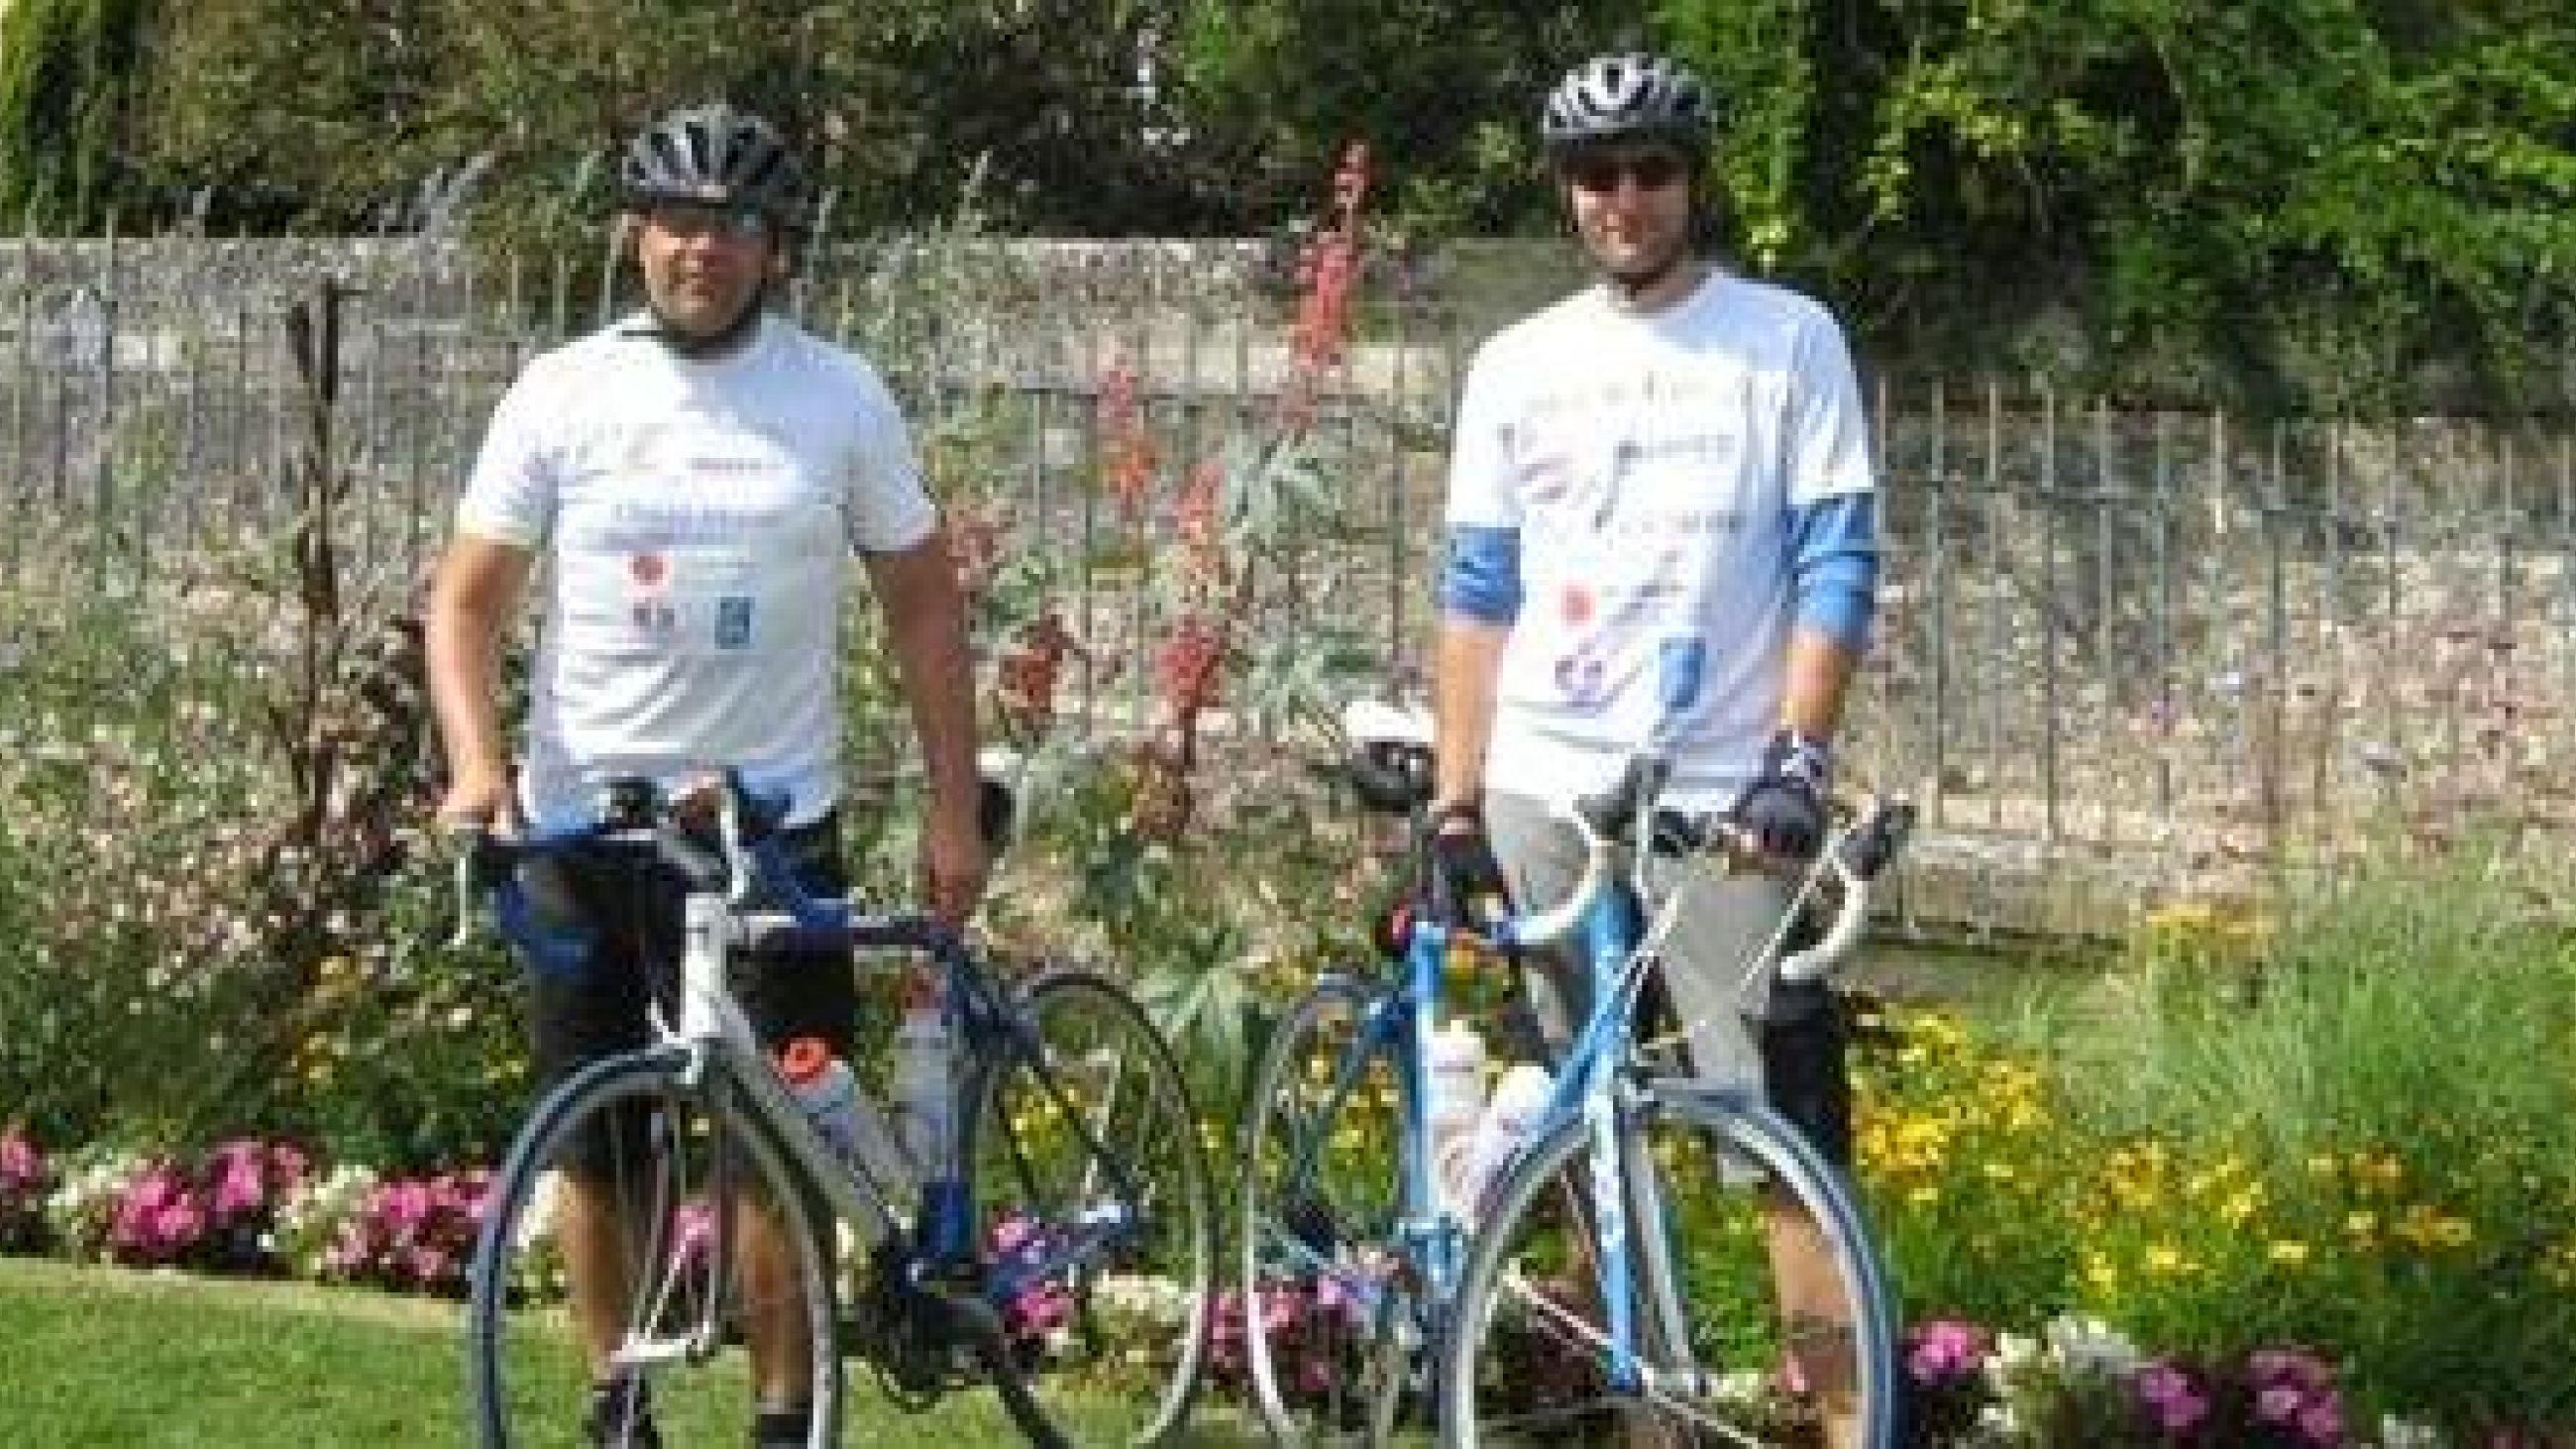 Parafix staff in Brighton to Paris cycle challenge